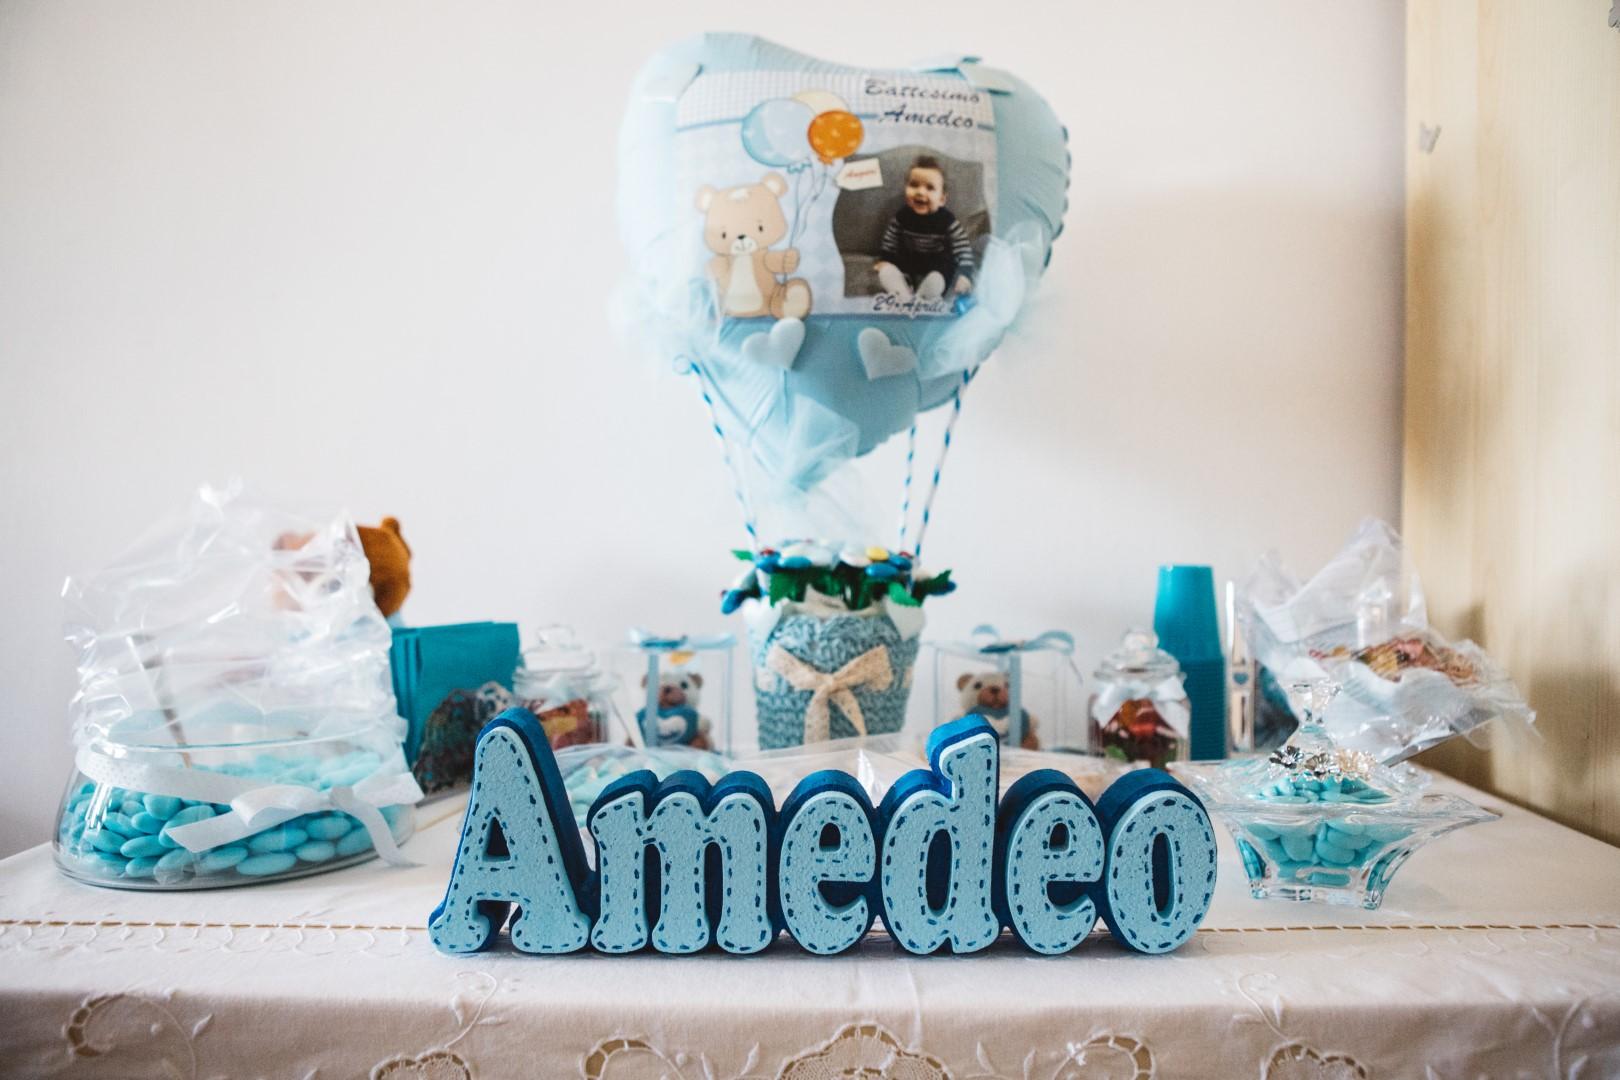 amedeo-4.jpg